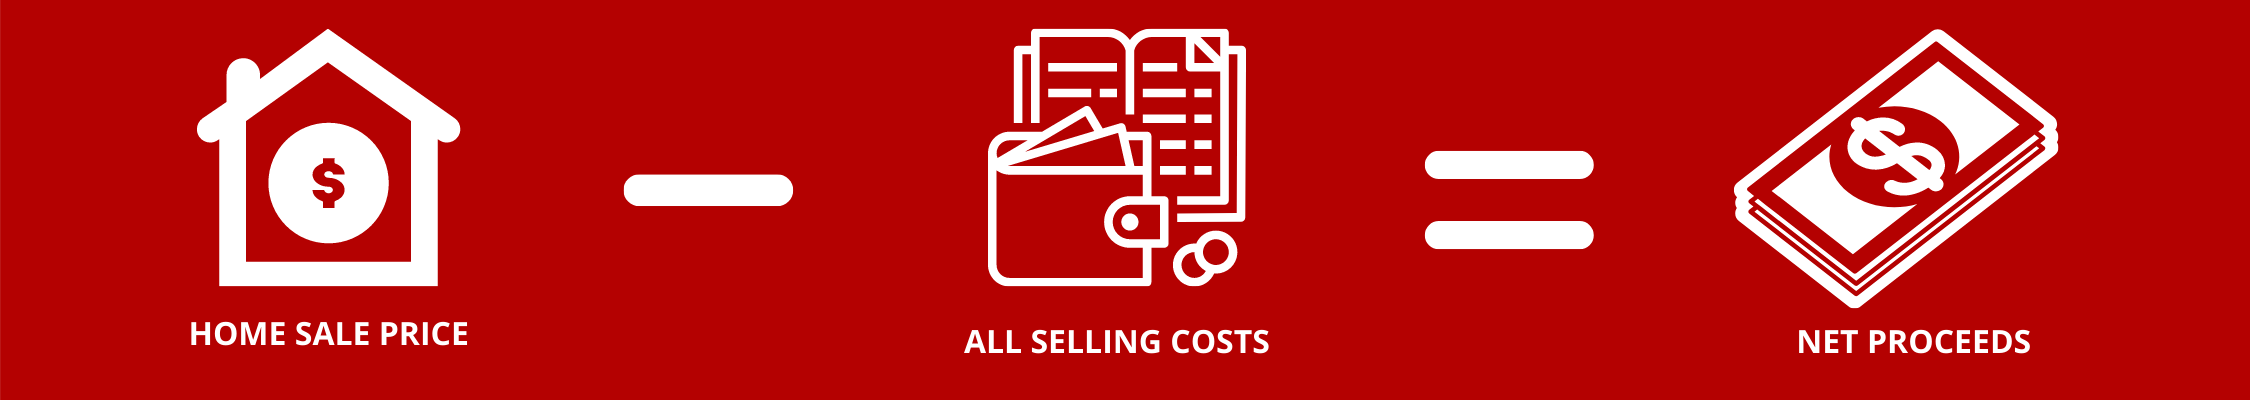 Home sale net proceeds calculation